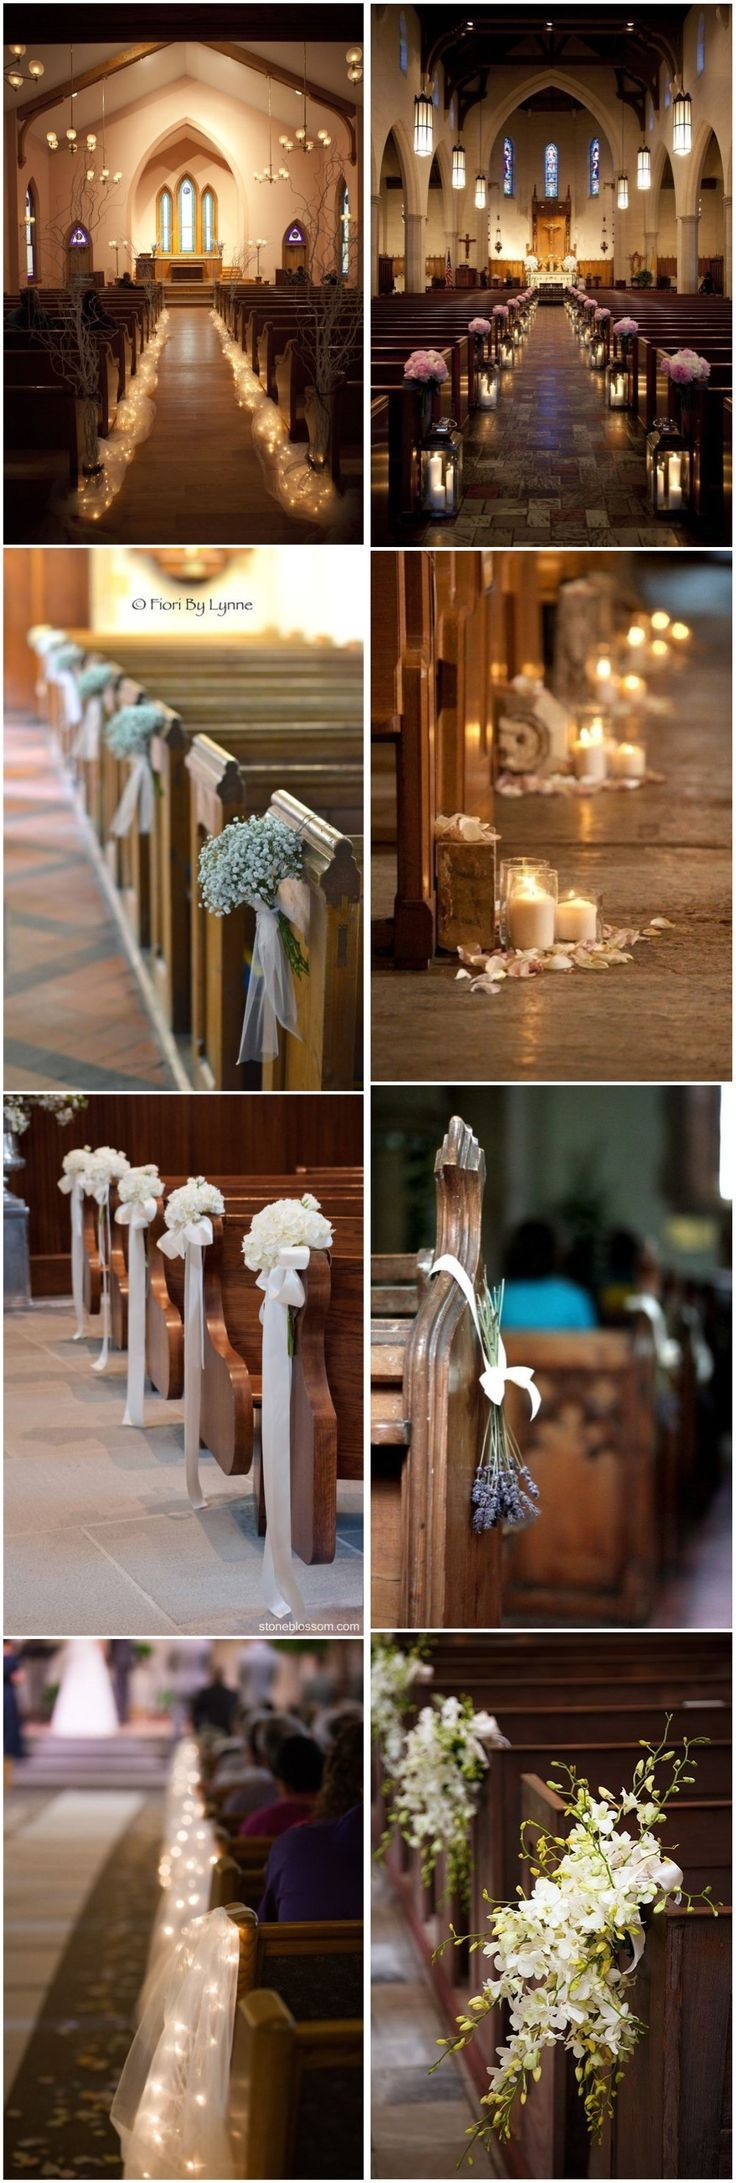 Church decorations also home  wedding aisles weddings and churches rh pinterest